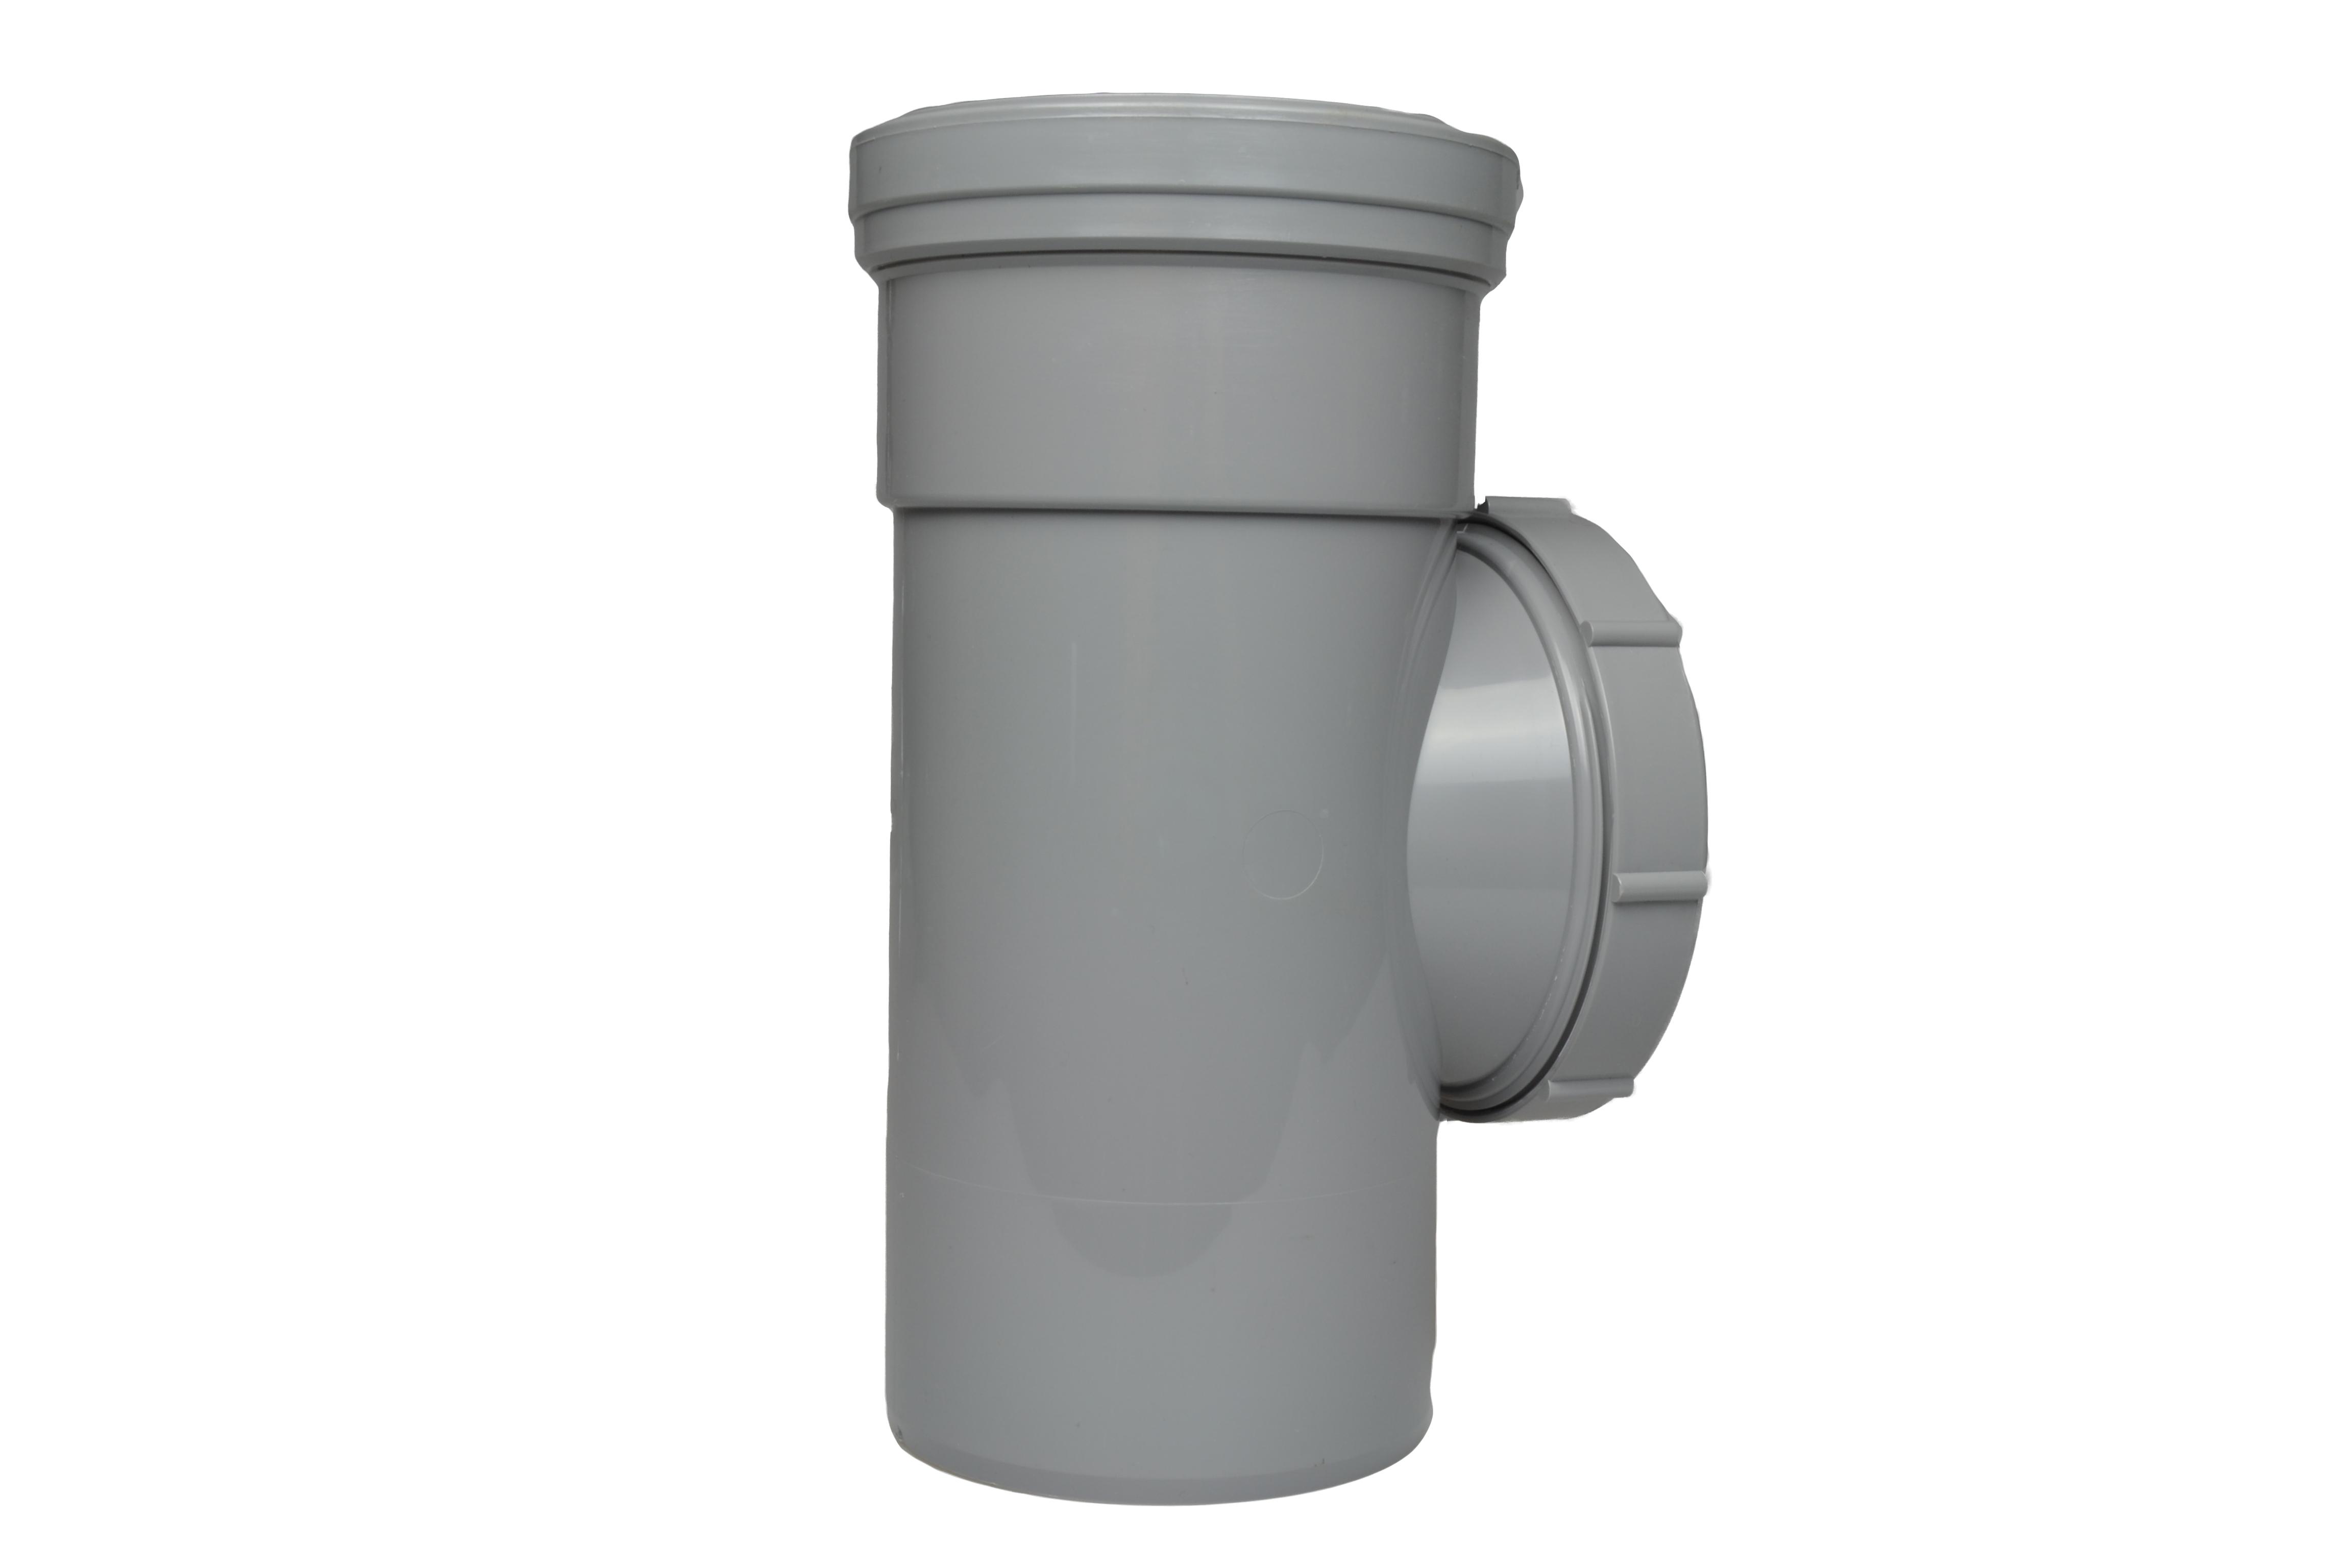 Soil Ring 92 Single Socket Access Pipe 110mm - Light Grey